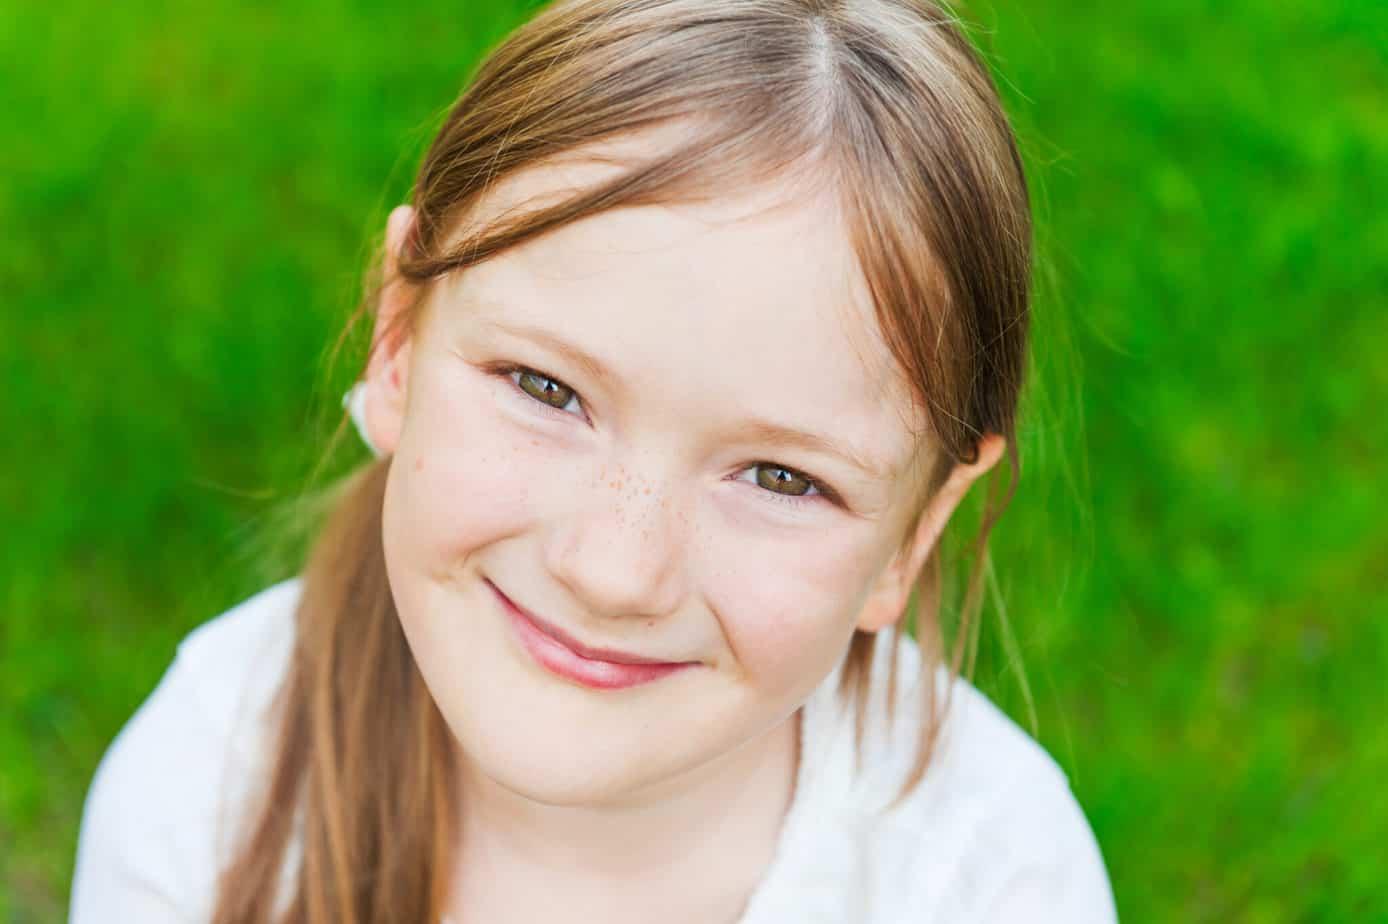 9 positive parenting tips for raising confident kids & nurturing self esteem. Boost your child's confidence & set them up for having positive self esteem.